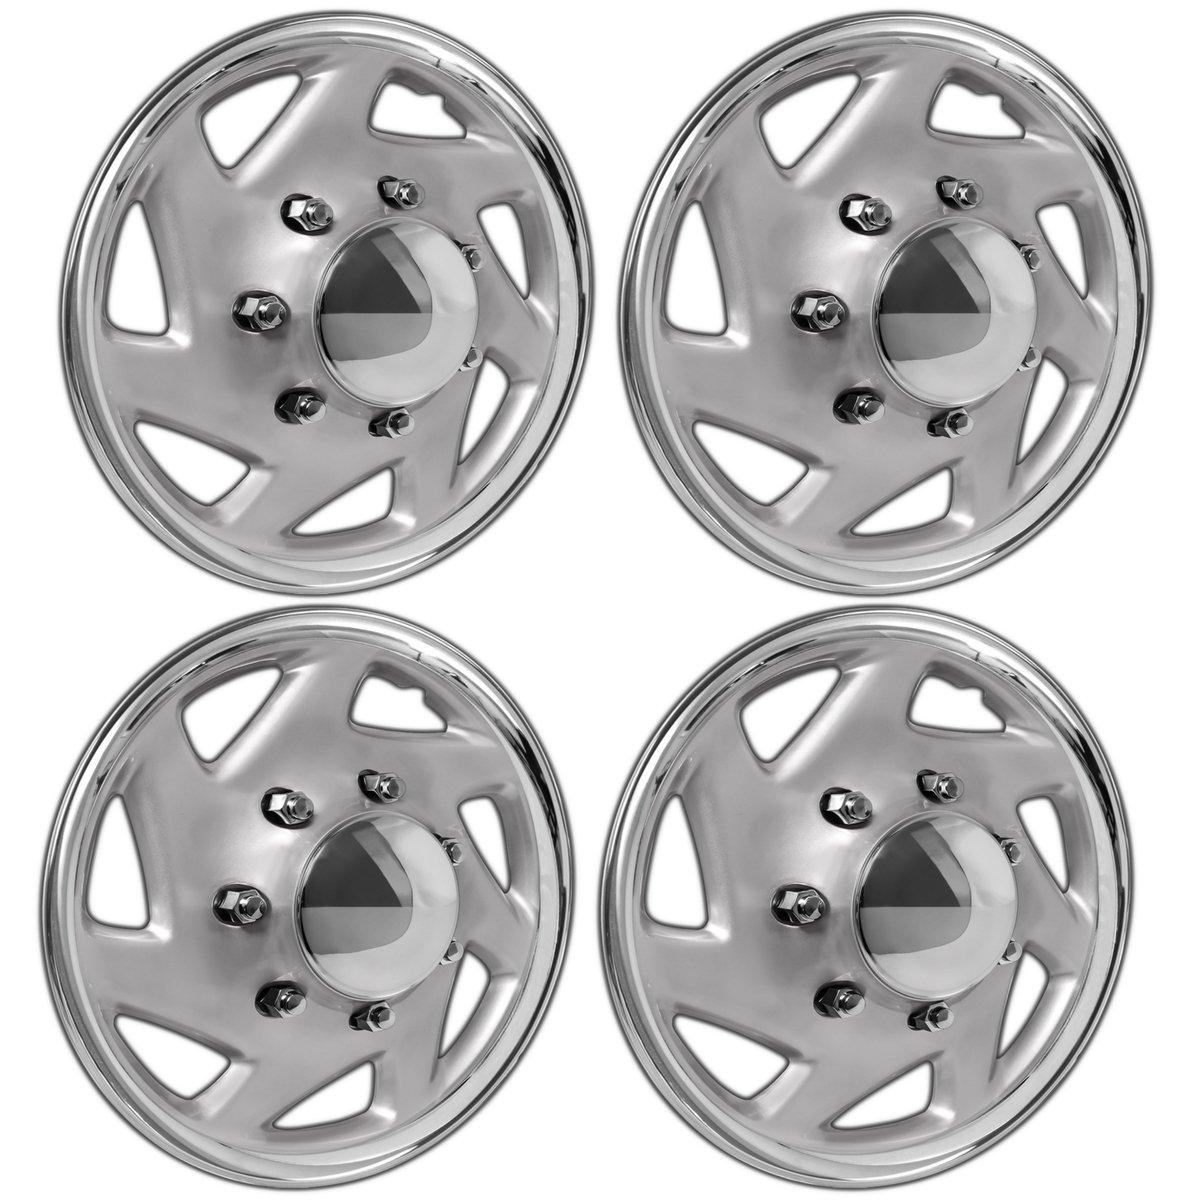 OxGord Hubcaps for Select Trucks & Cargo Vans (Pack of 4) Wheel Covers - 16 Inch, 7 Spoke, Snap On, Silver Chrome